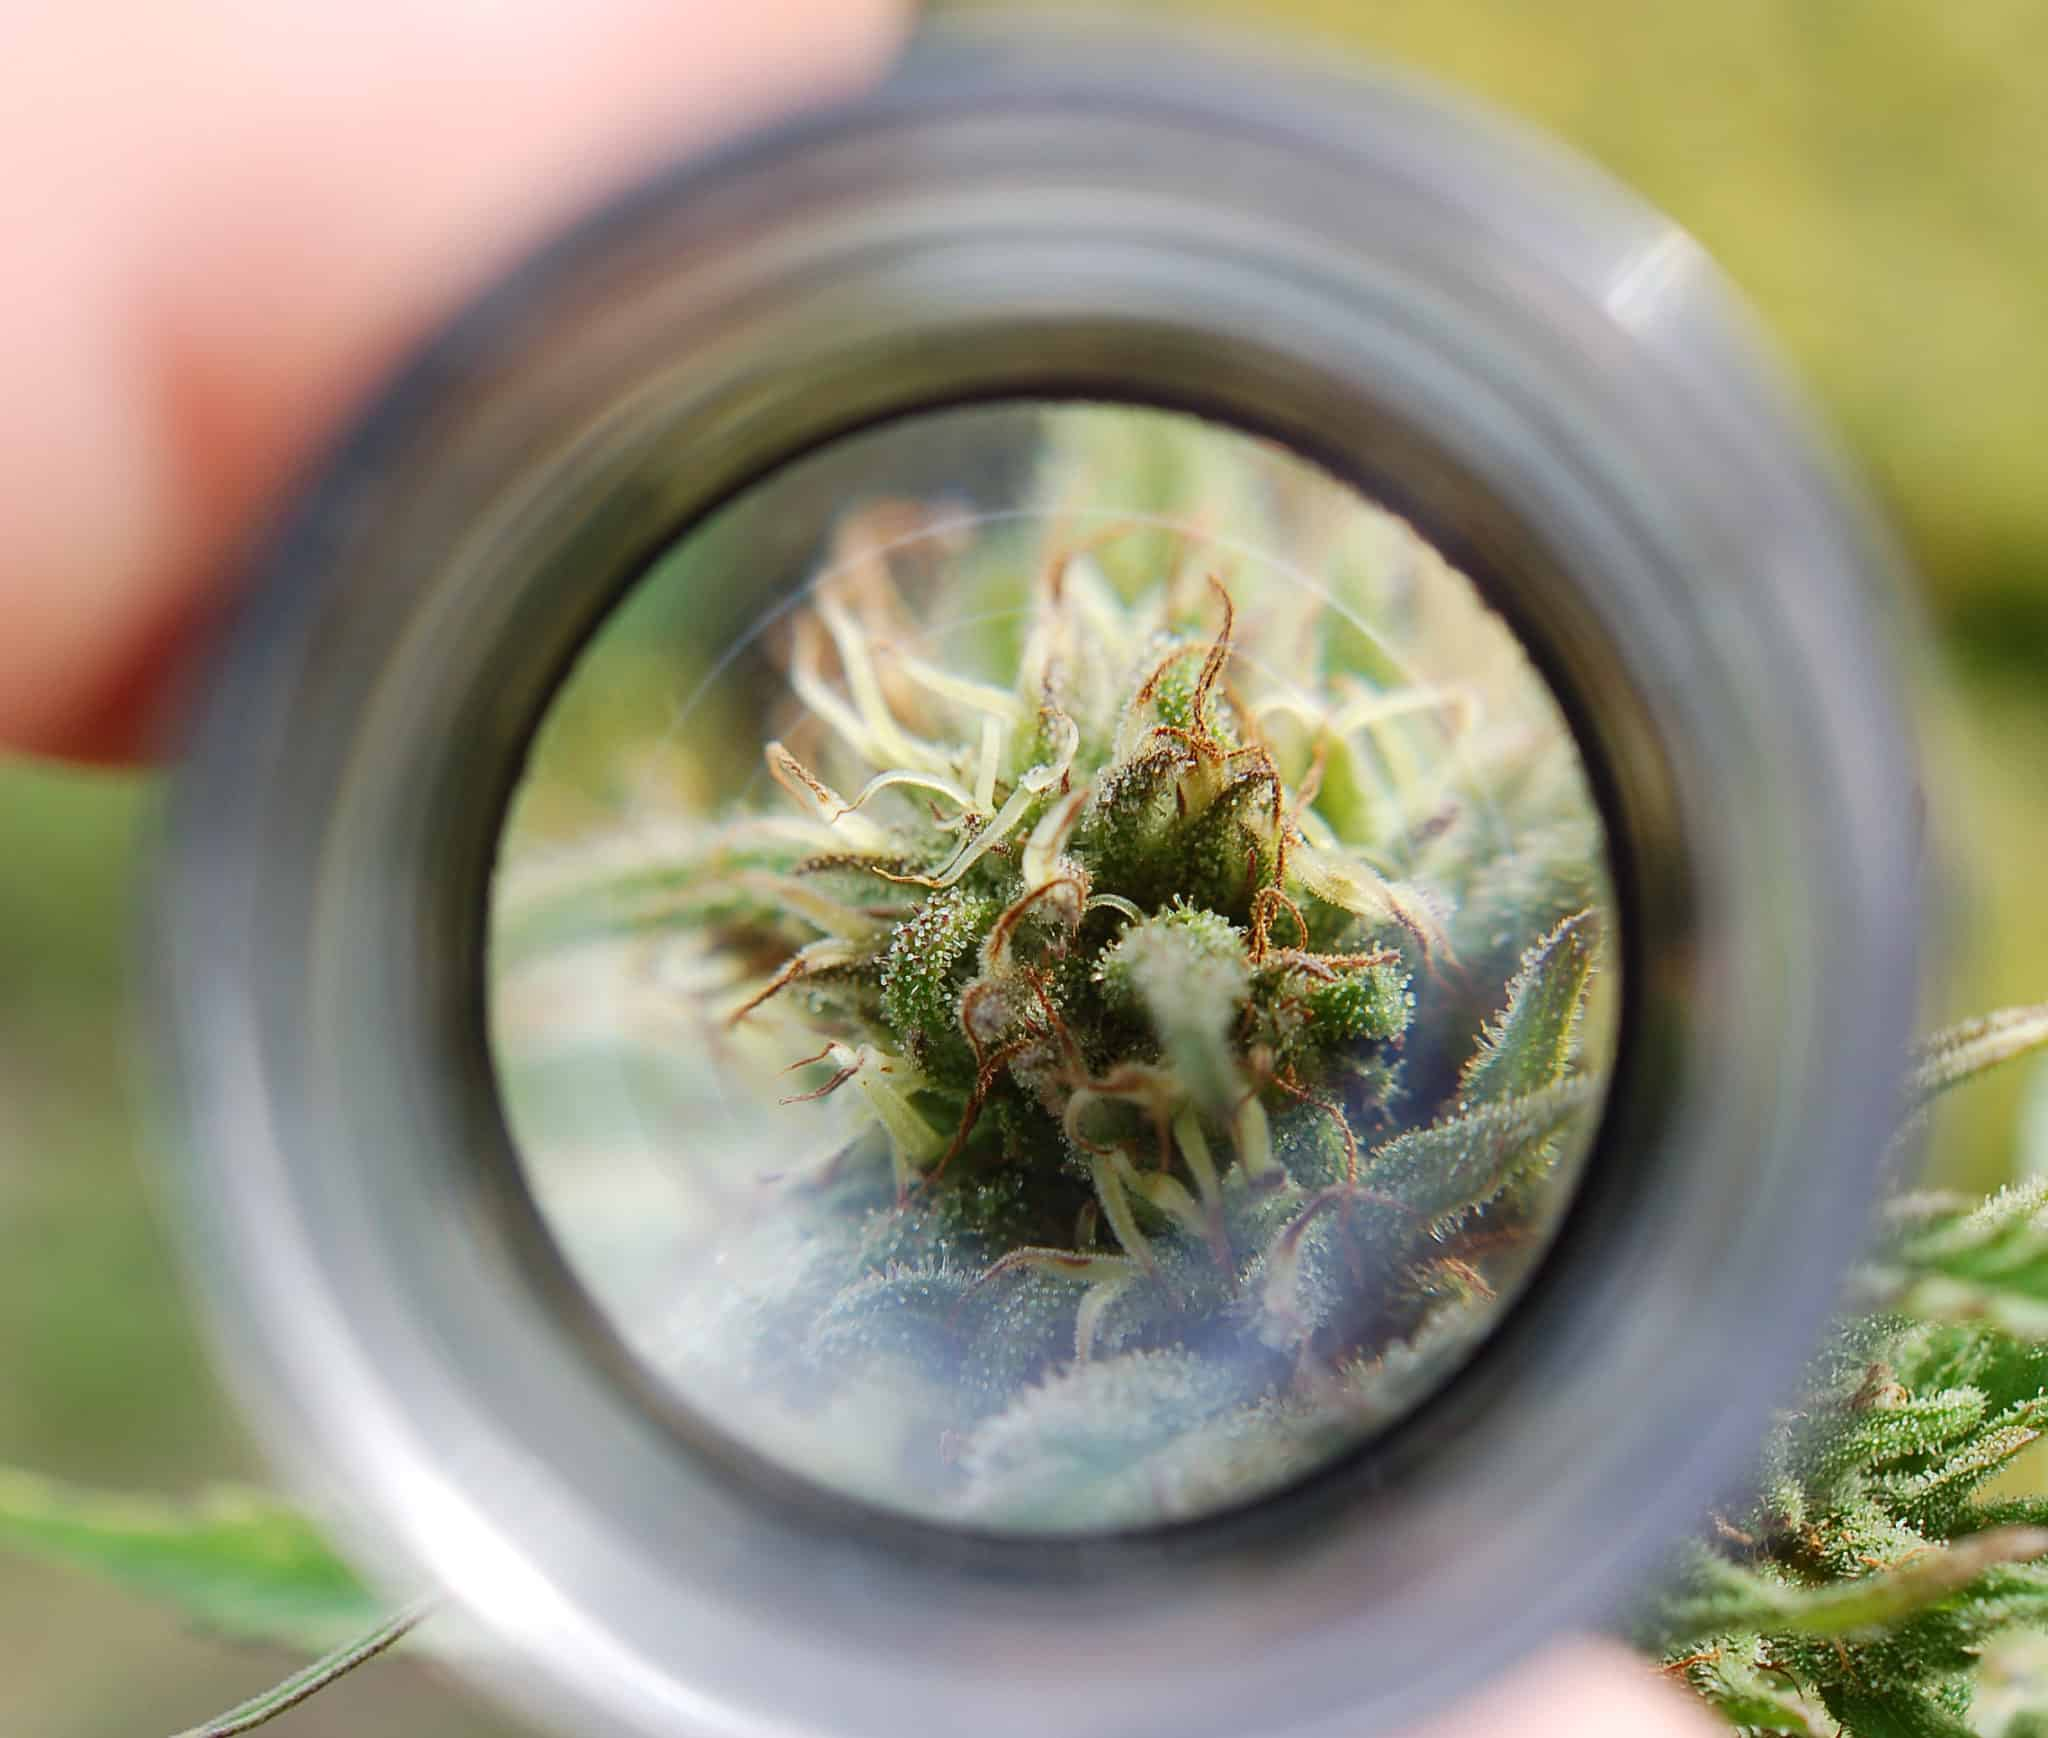 Loupe cannabis